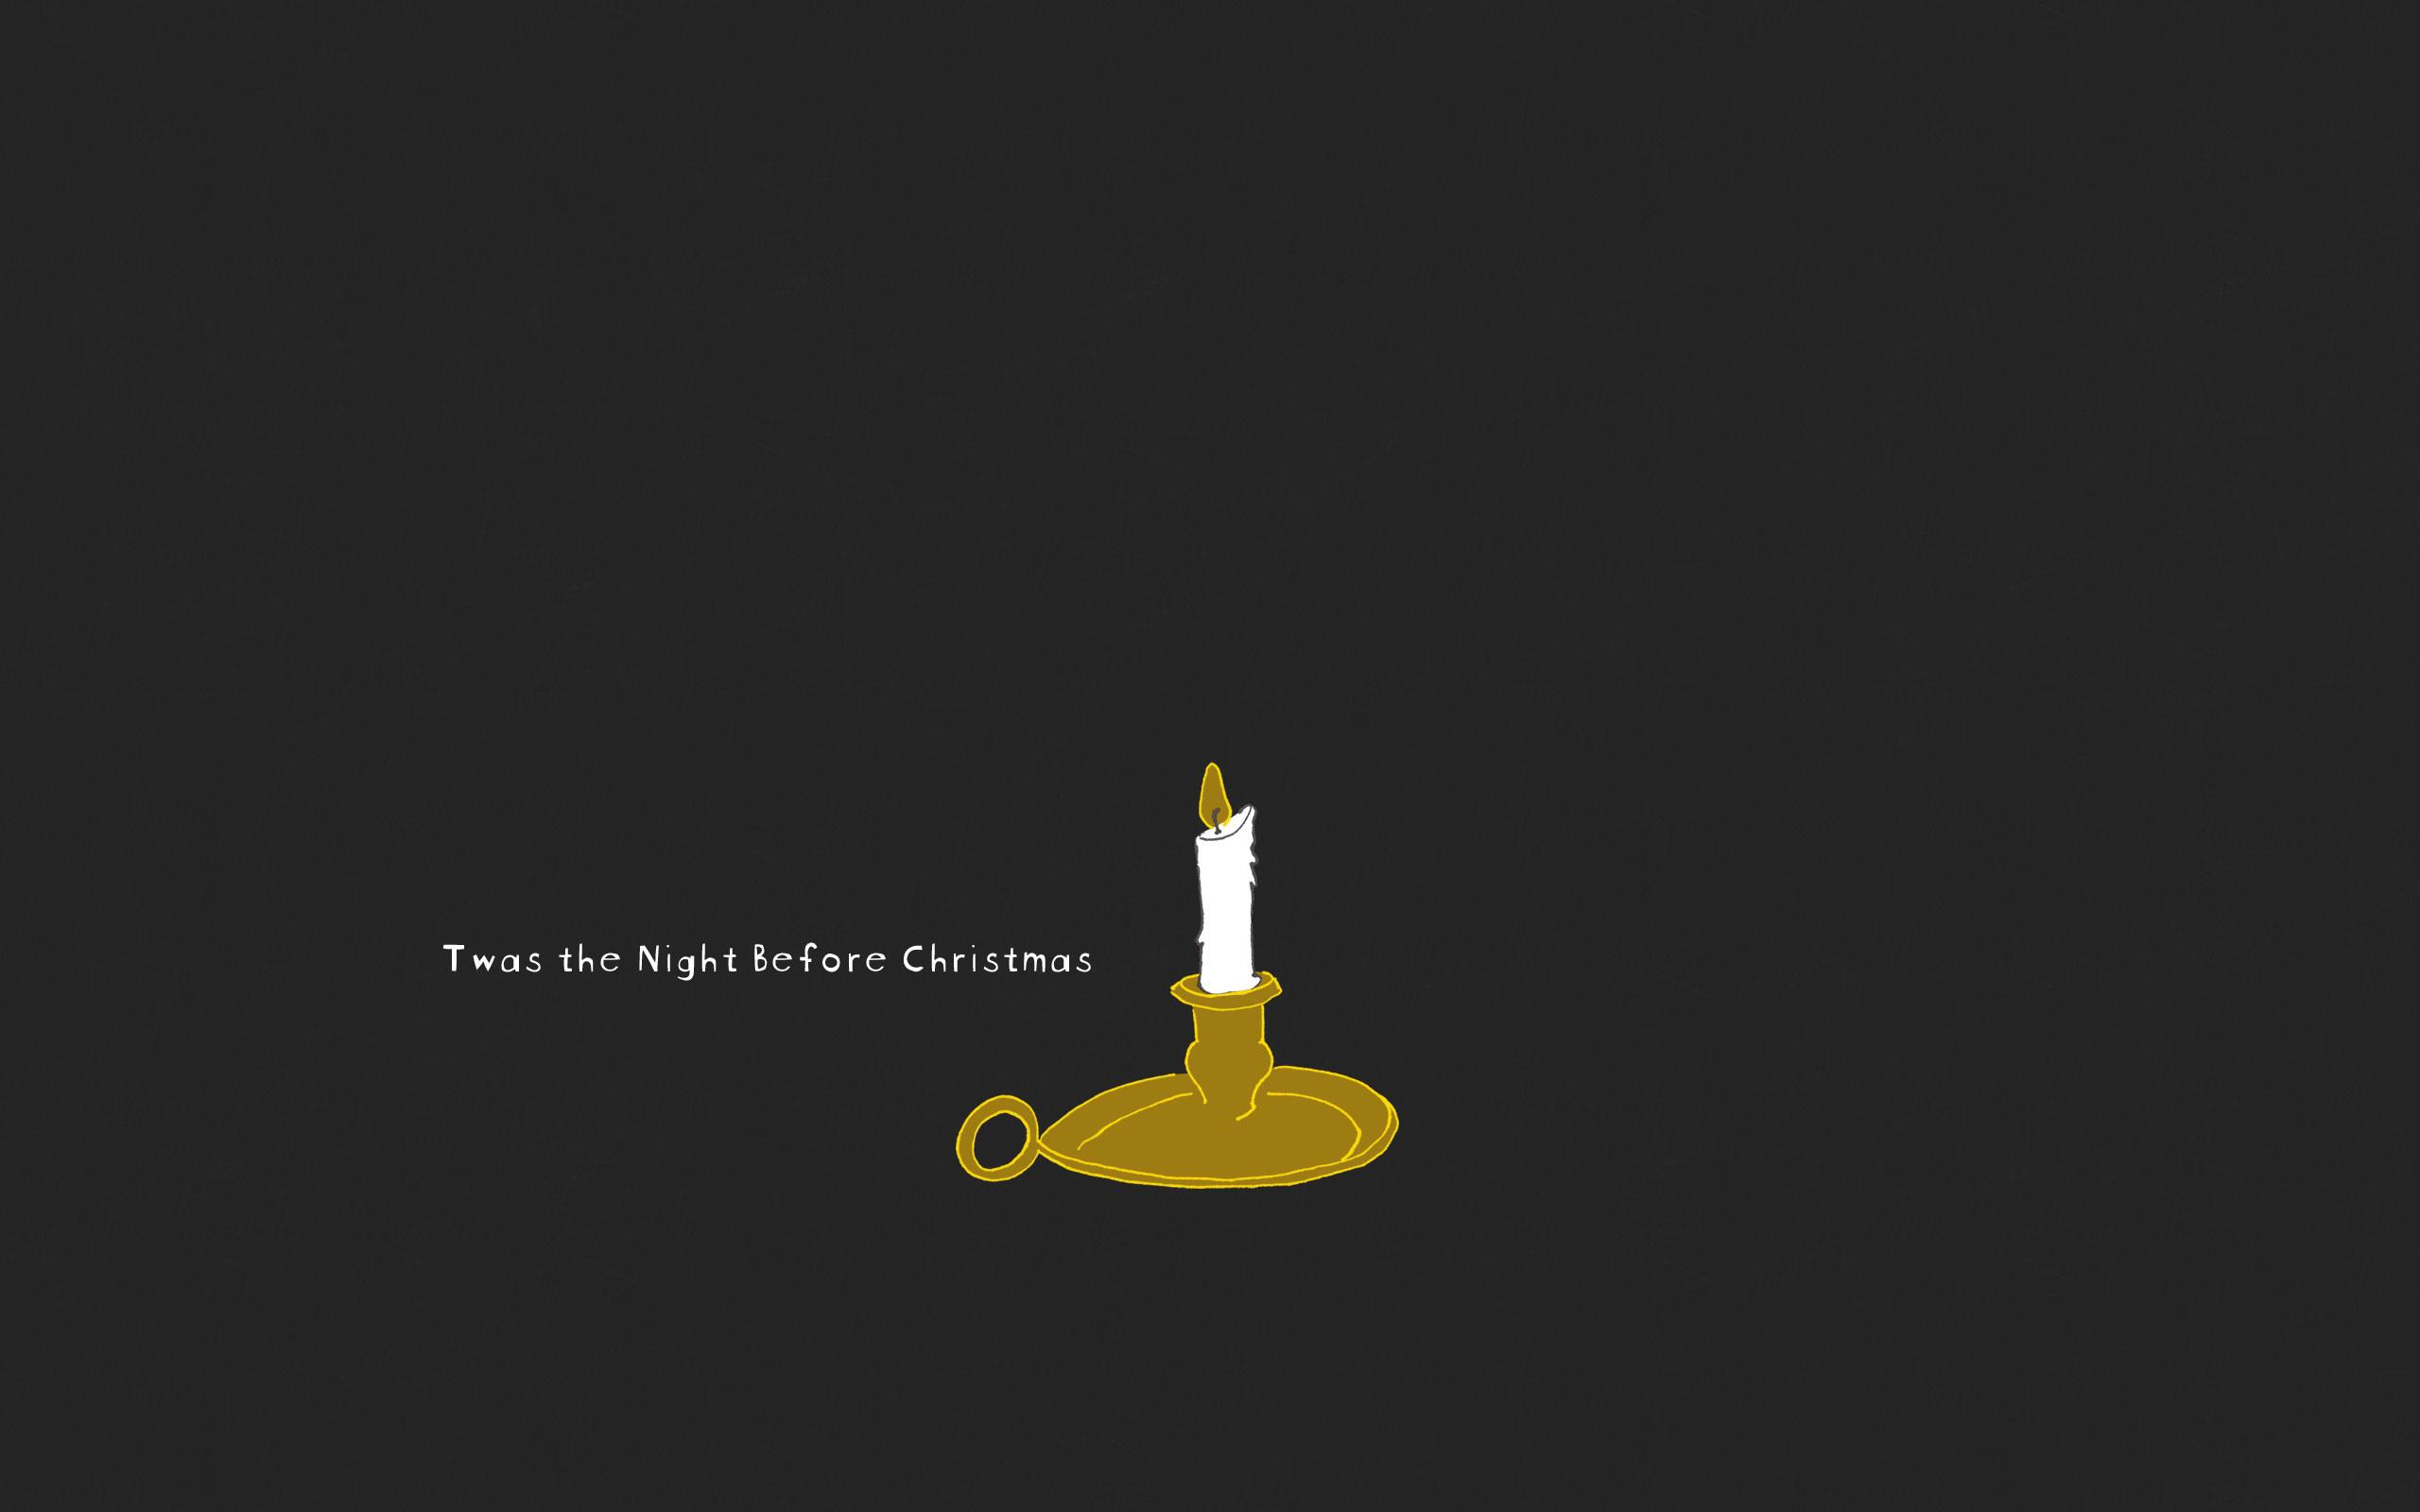 holiday-wallpaper-desktop-twas-the-night-before-christmas.